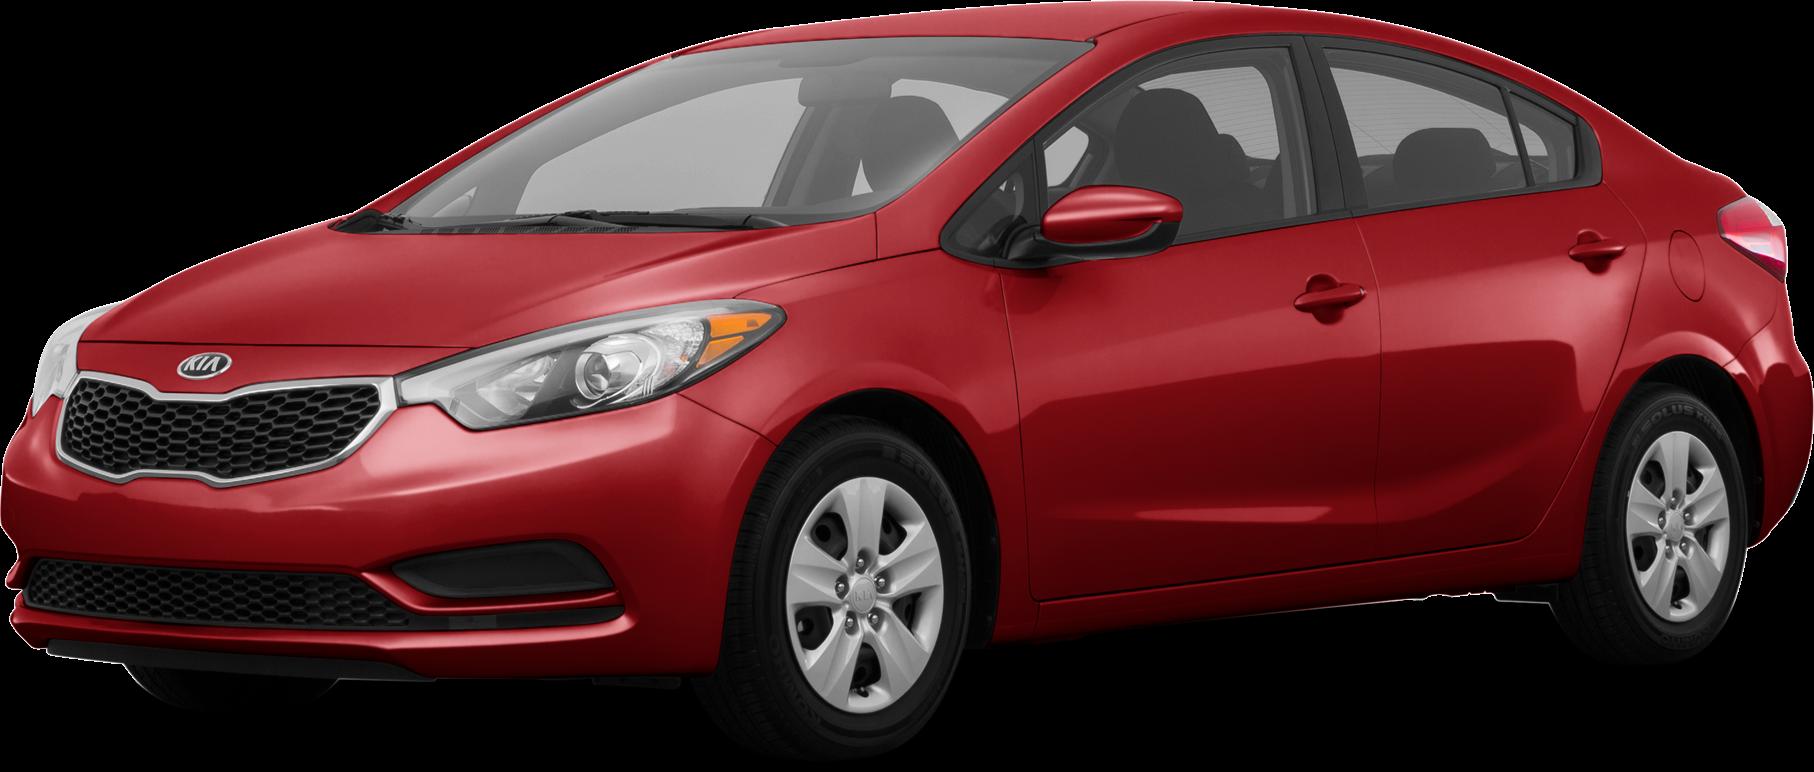 2016 Kia Rio | Pricing, Ratings, Expert Review | Kelley Blue